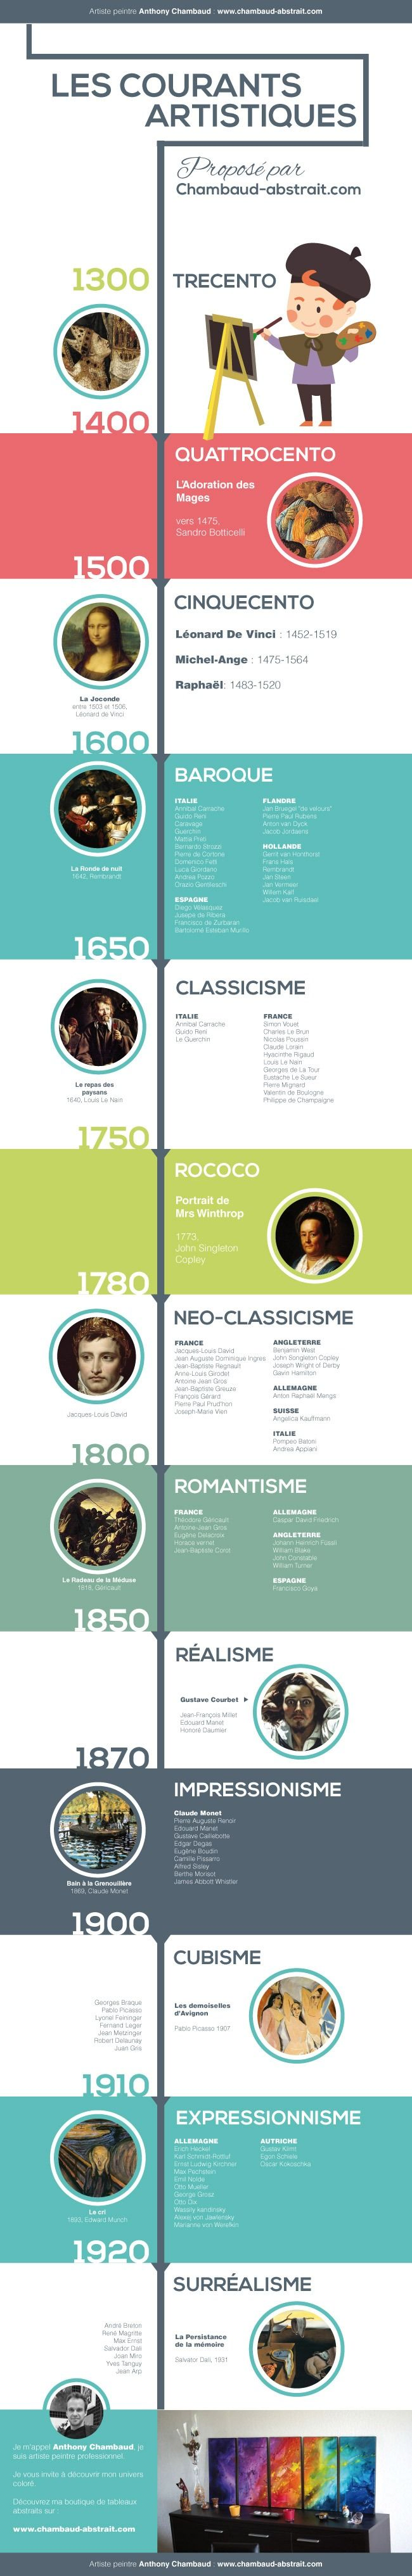 infographie courants artistiques, chronologie, tableau, artistes, history timeline, art,  http://www.amylee.fr/2016/05/courants-artistiques/